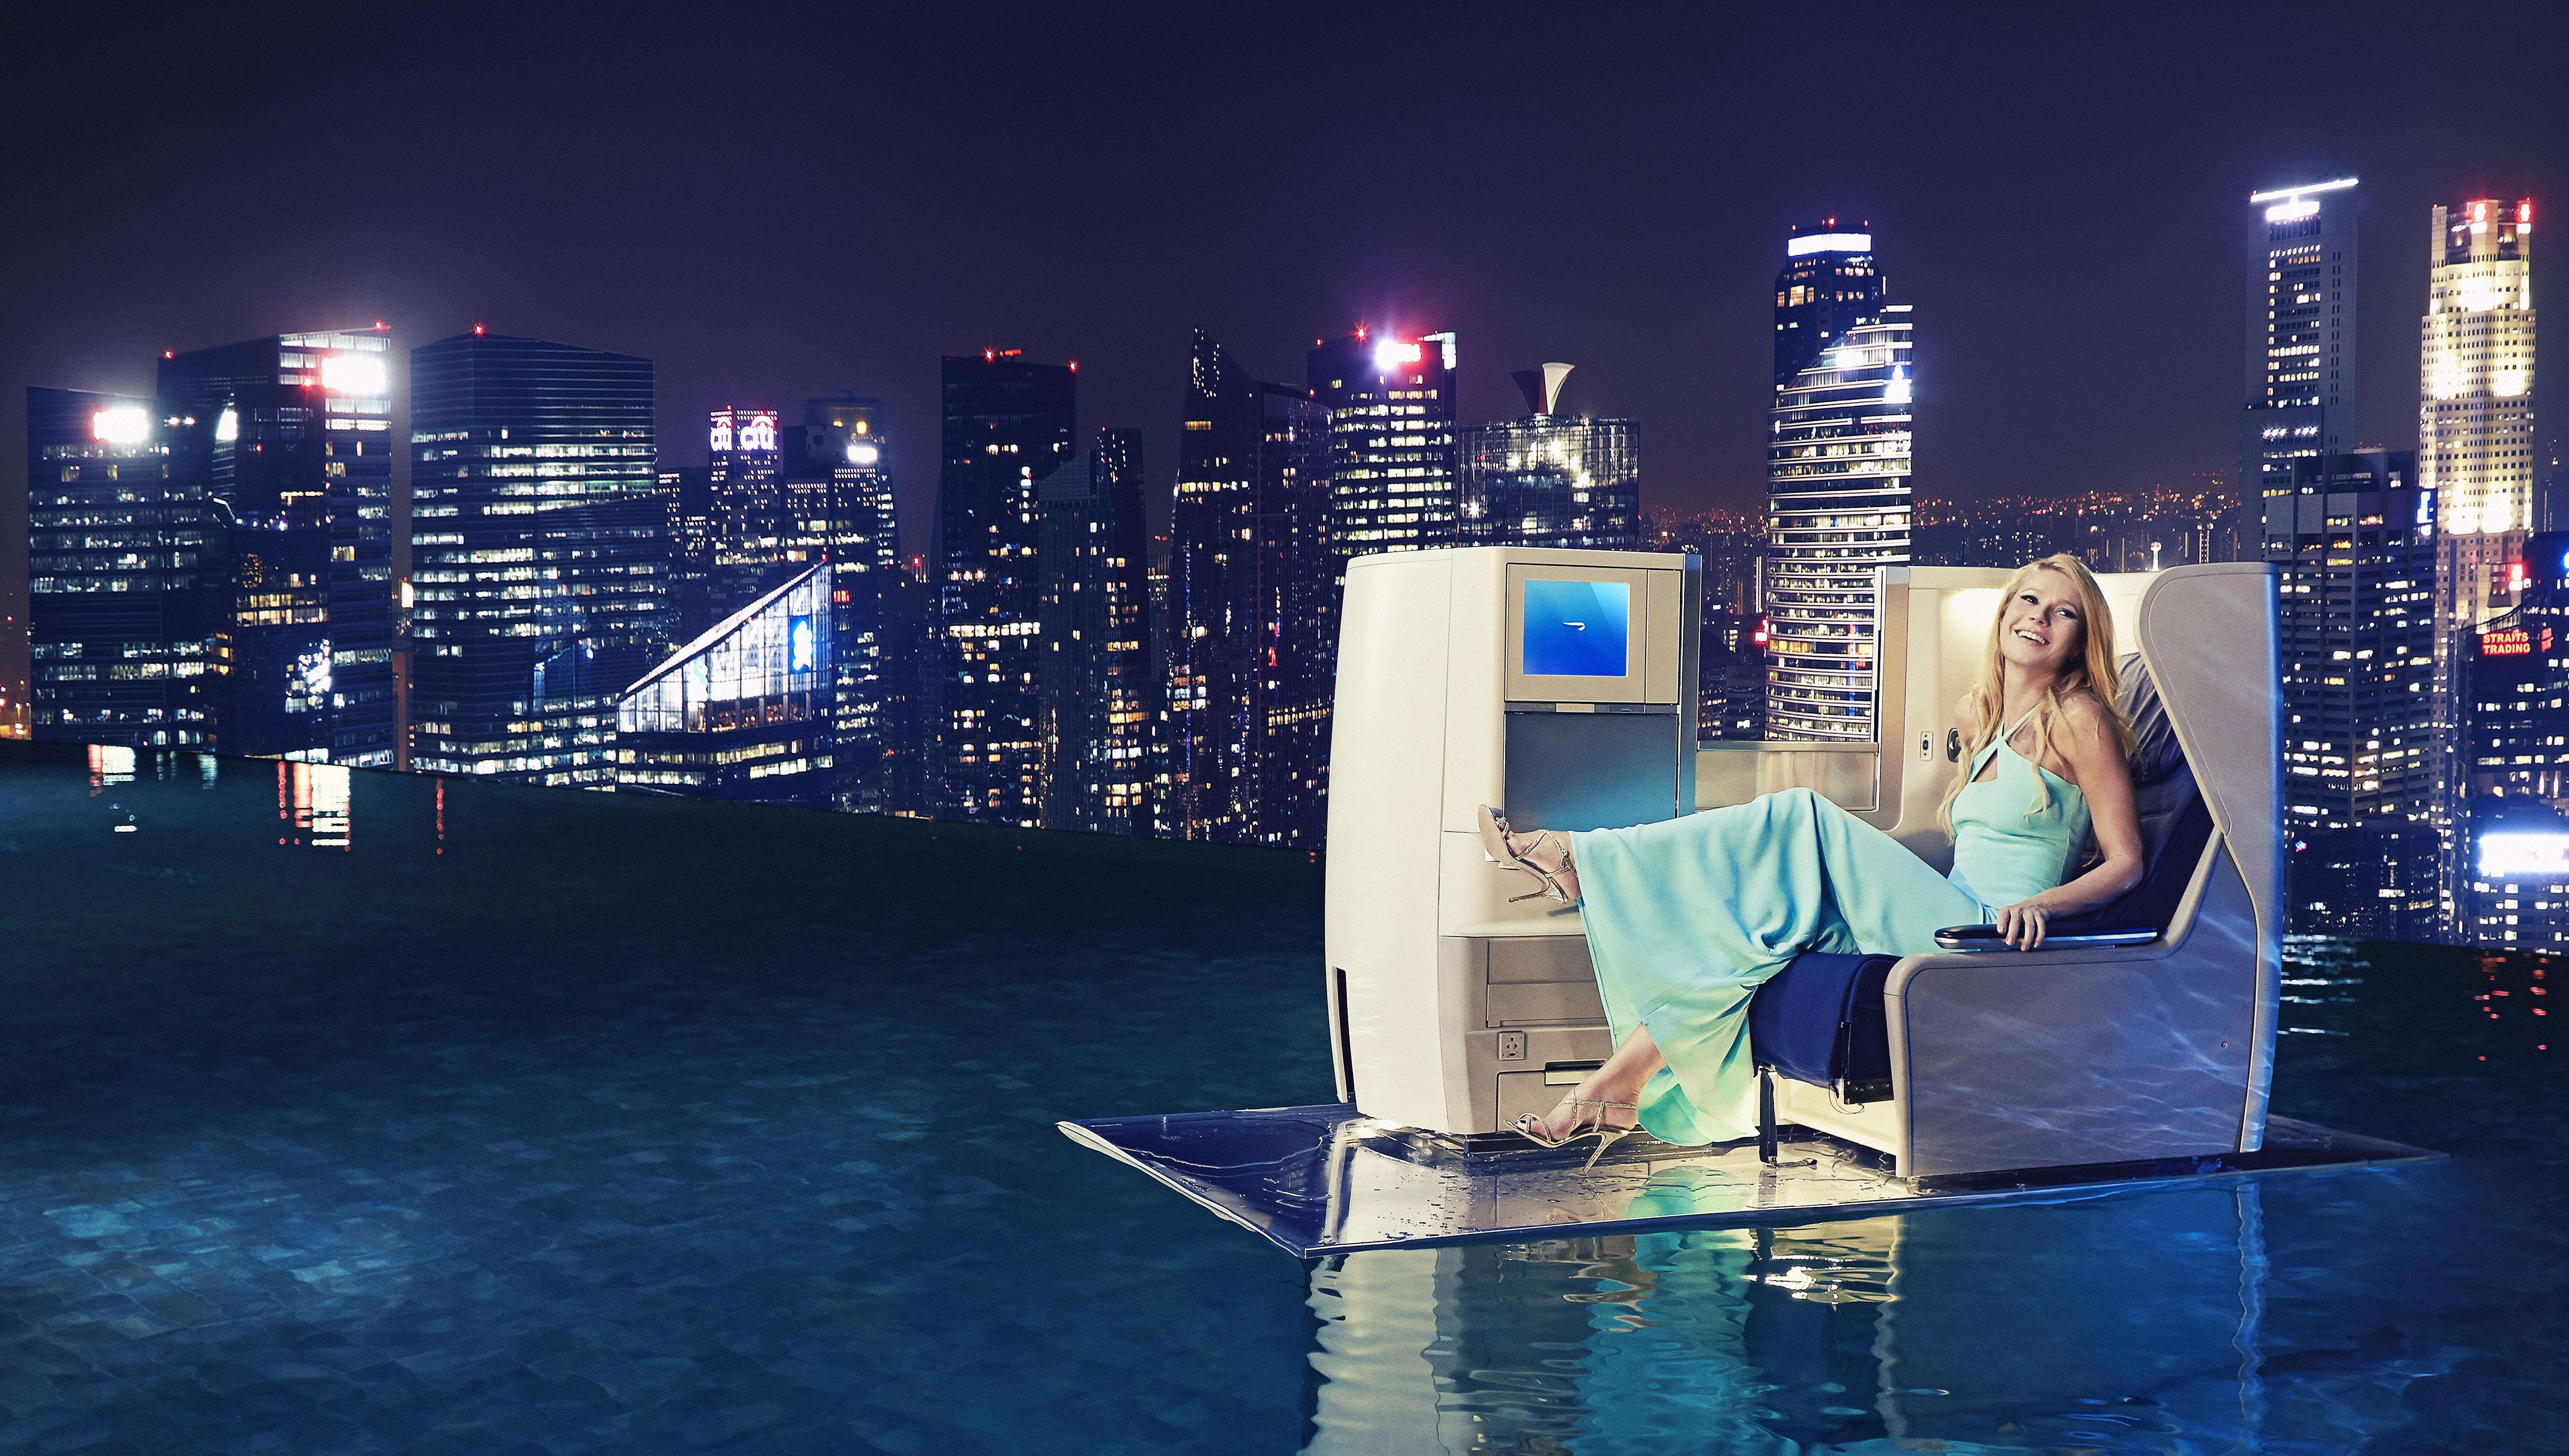 Eurovíkendy-Singapur-Marina-Bay-Sands-infinity-bazén